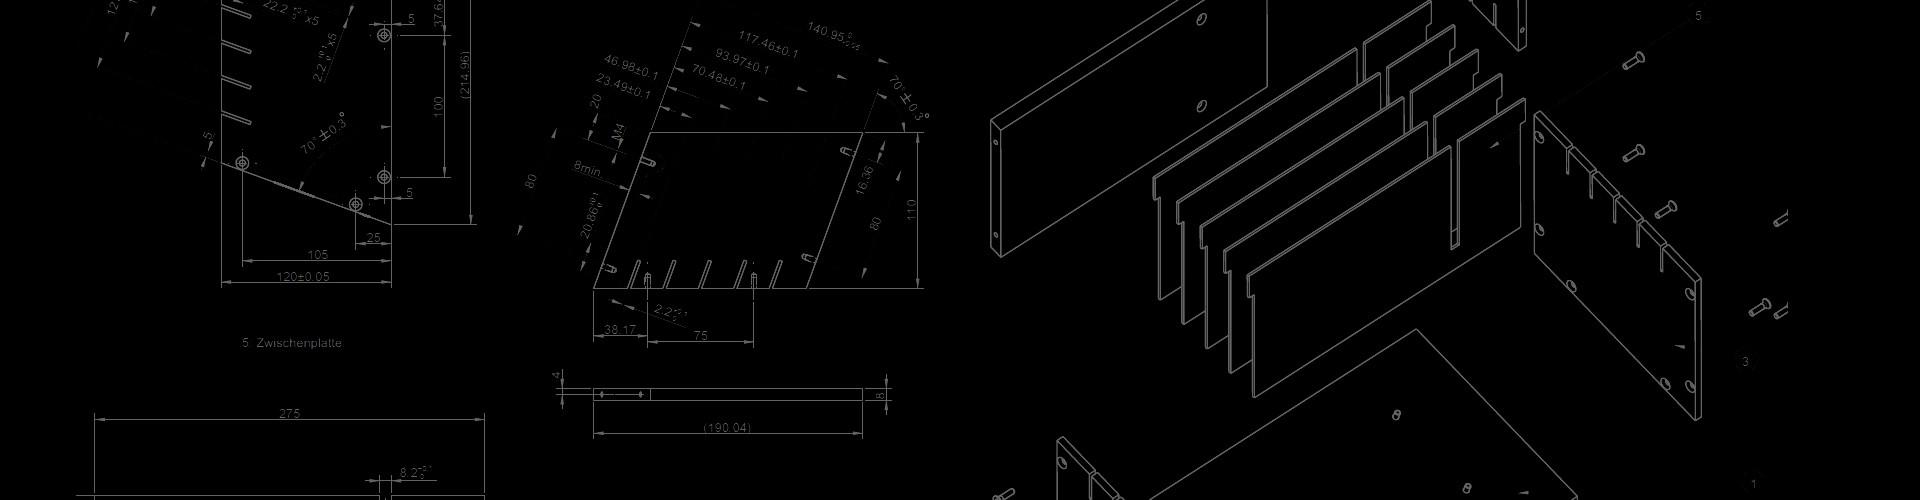 technical drawing Fiberdraft